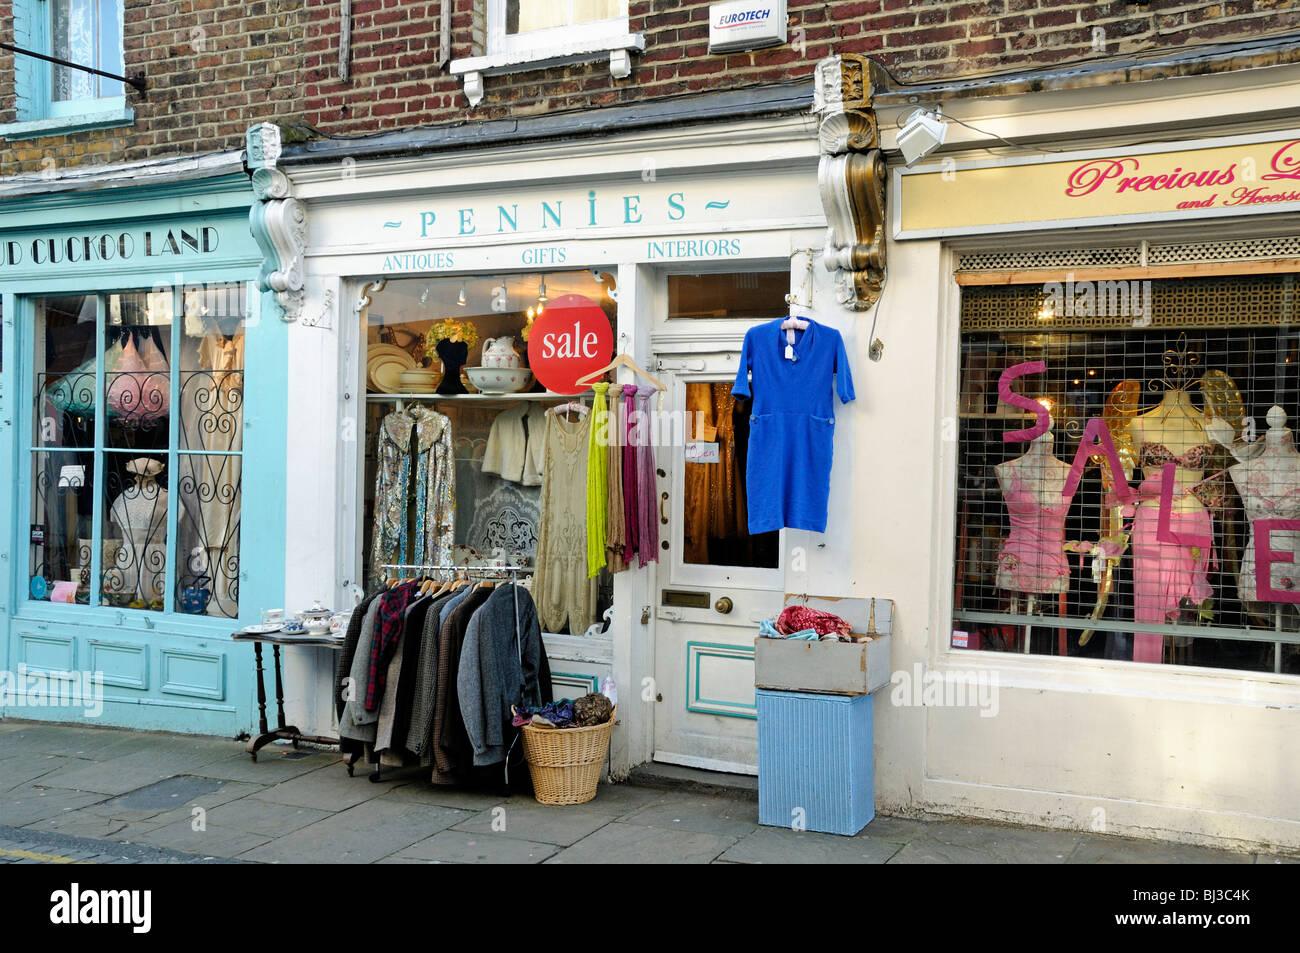 Pennies vintage clothes shop, Camden Passage, Islington, London, England Britain UK - Stock Image